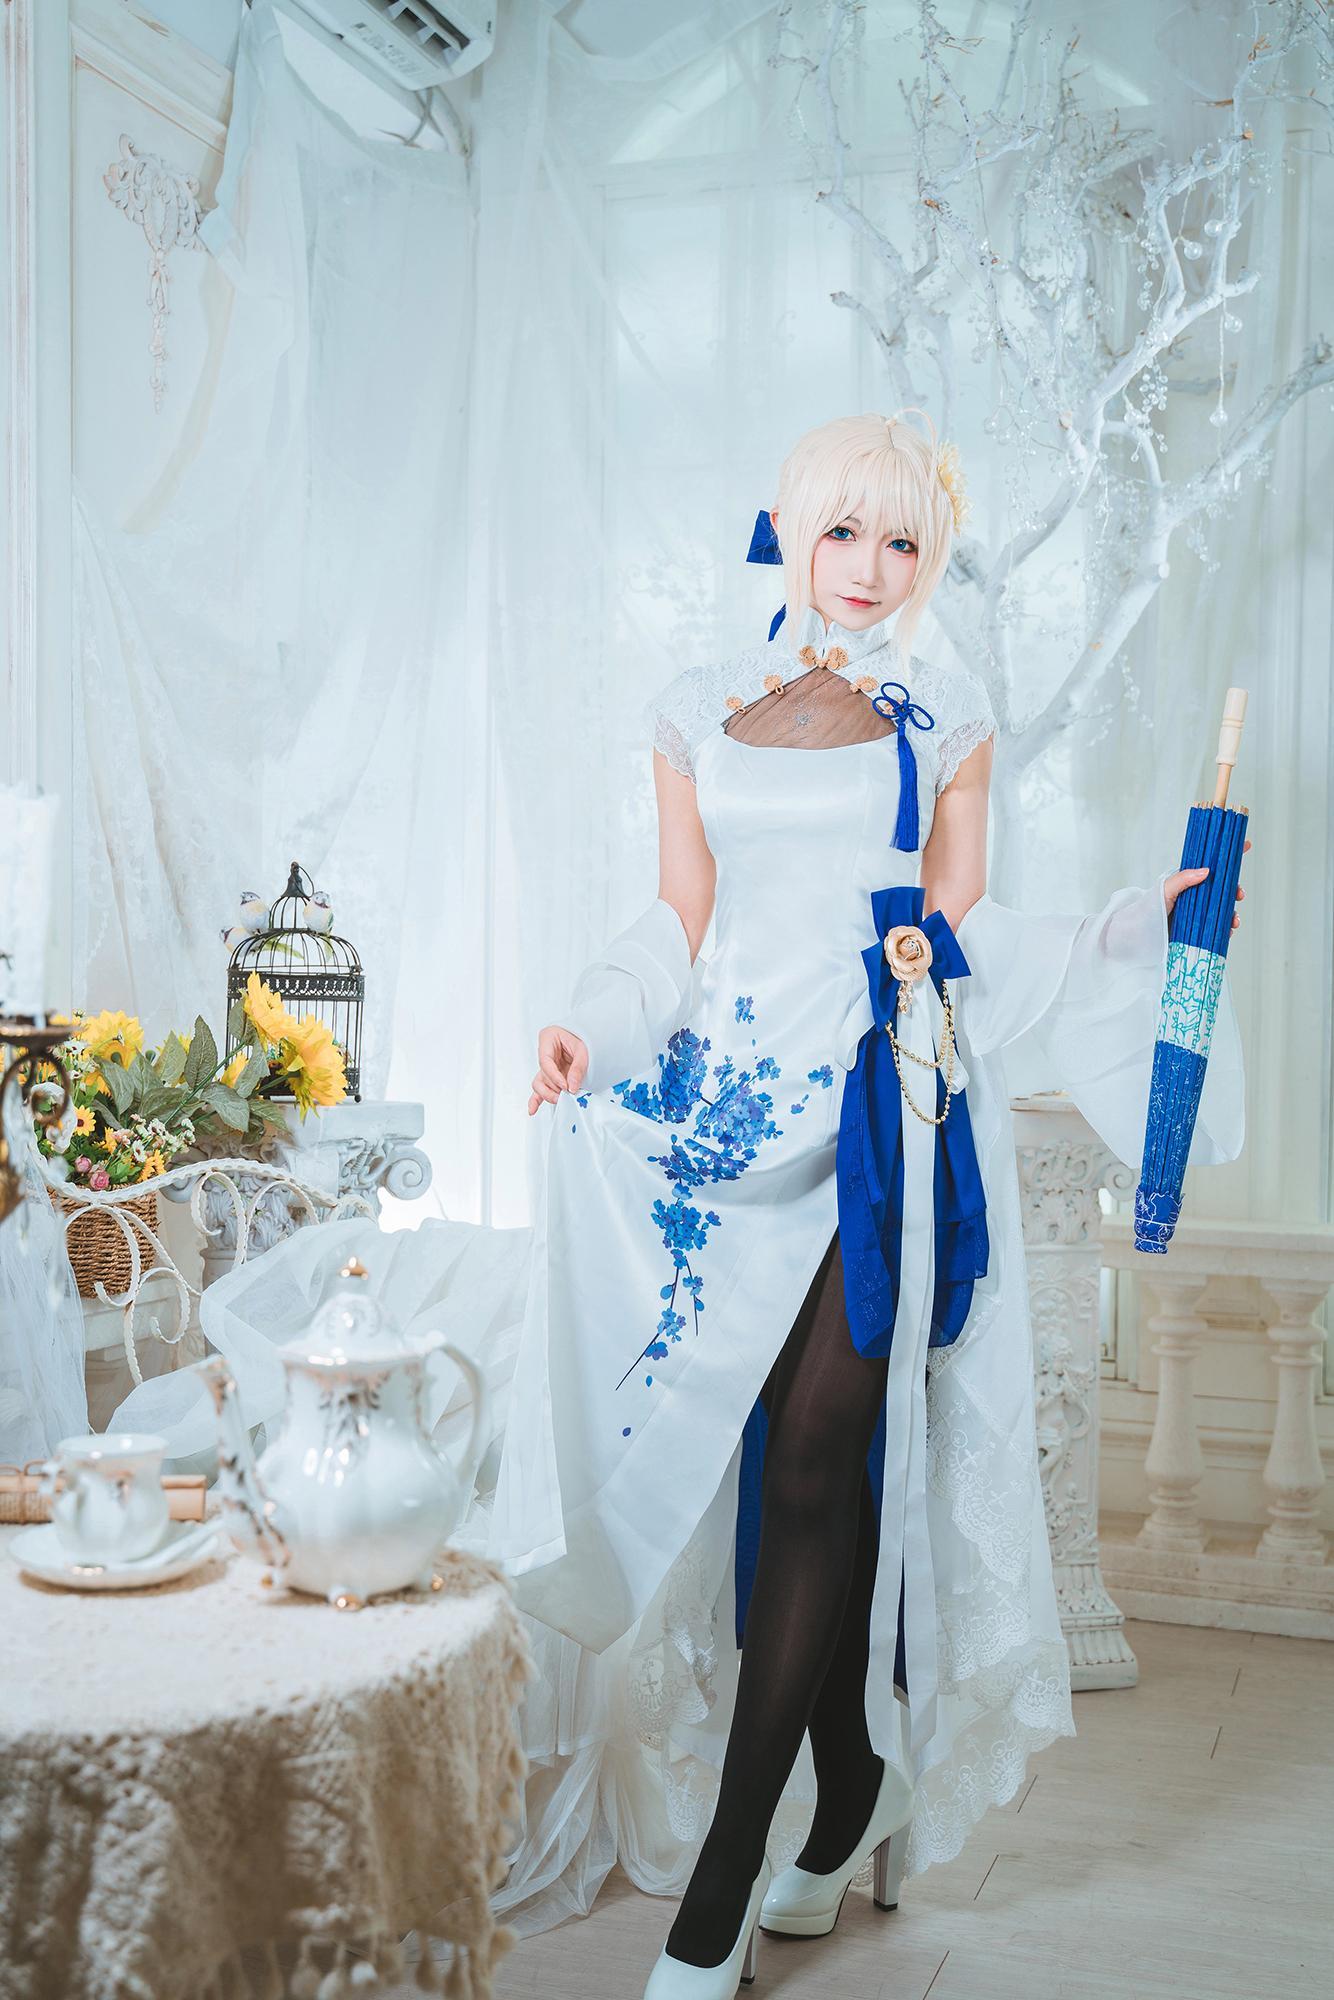 《FATE/GRAND ORDER》旗袍cosplay【CN:许多鱼鱼鱼】-第7张